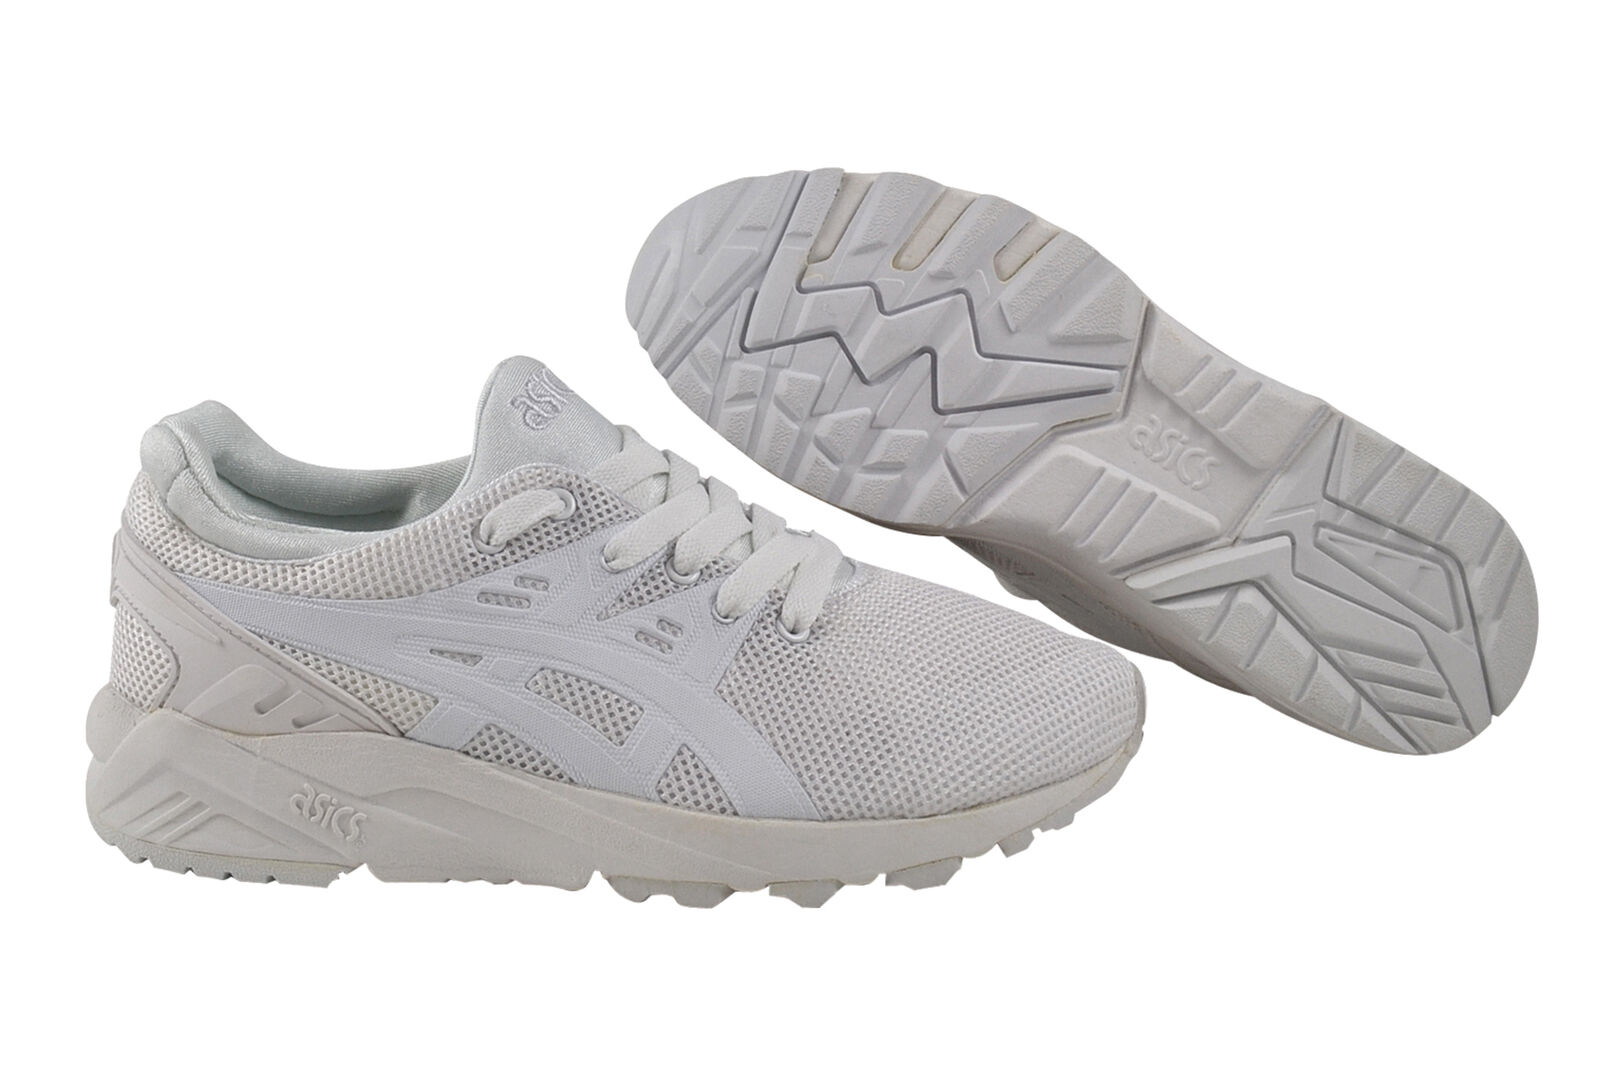 Zapatos casuales salvajes Asics GEL-Kayano entrenador evo White/White Sneaker/zapatos h5y3q 0101 blanco